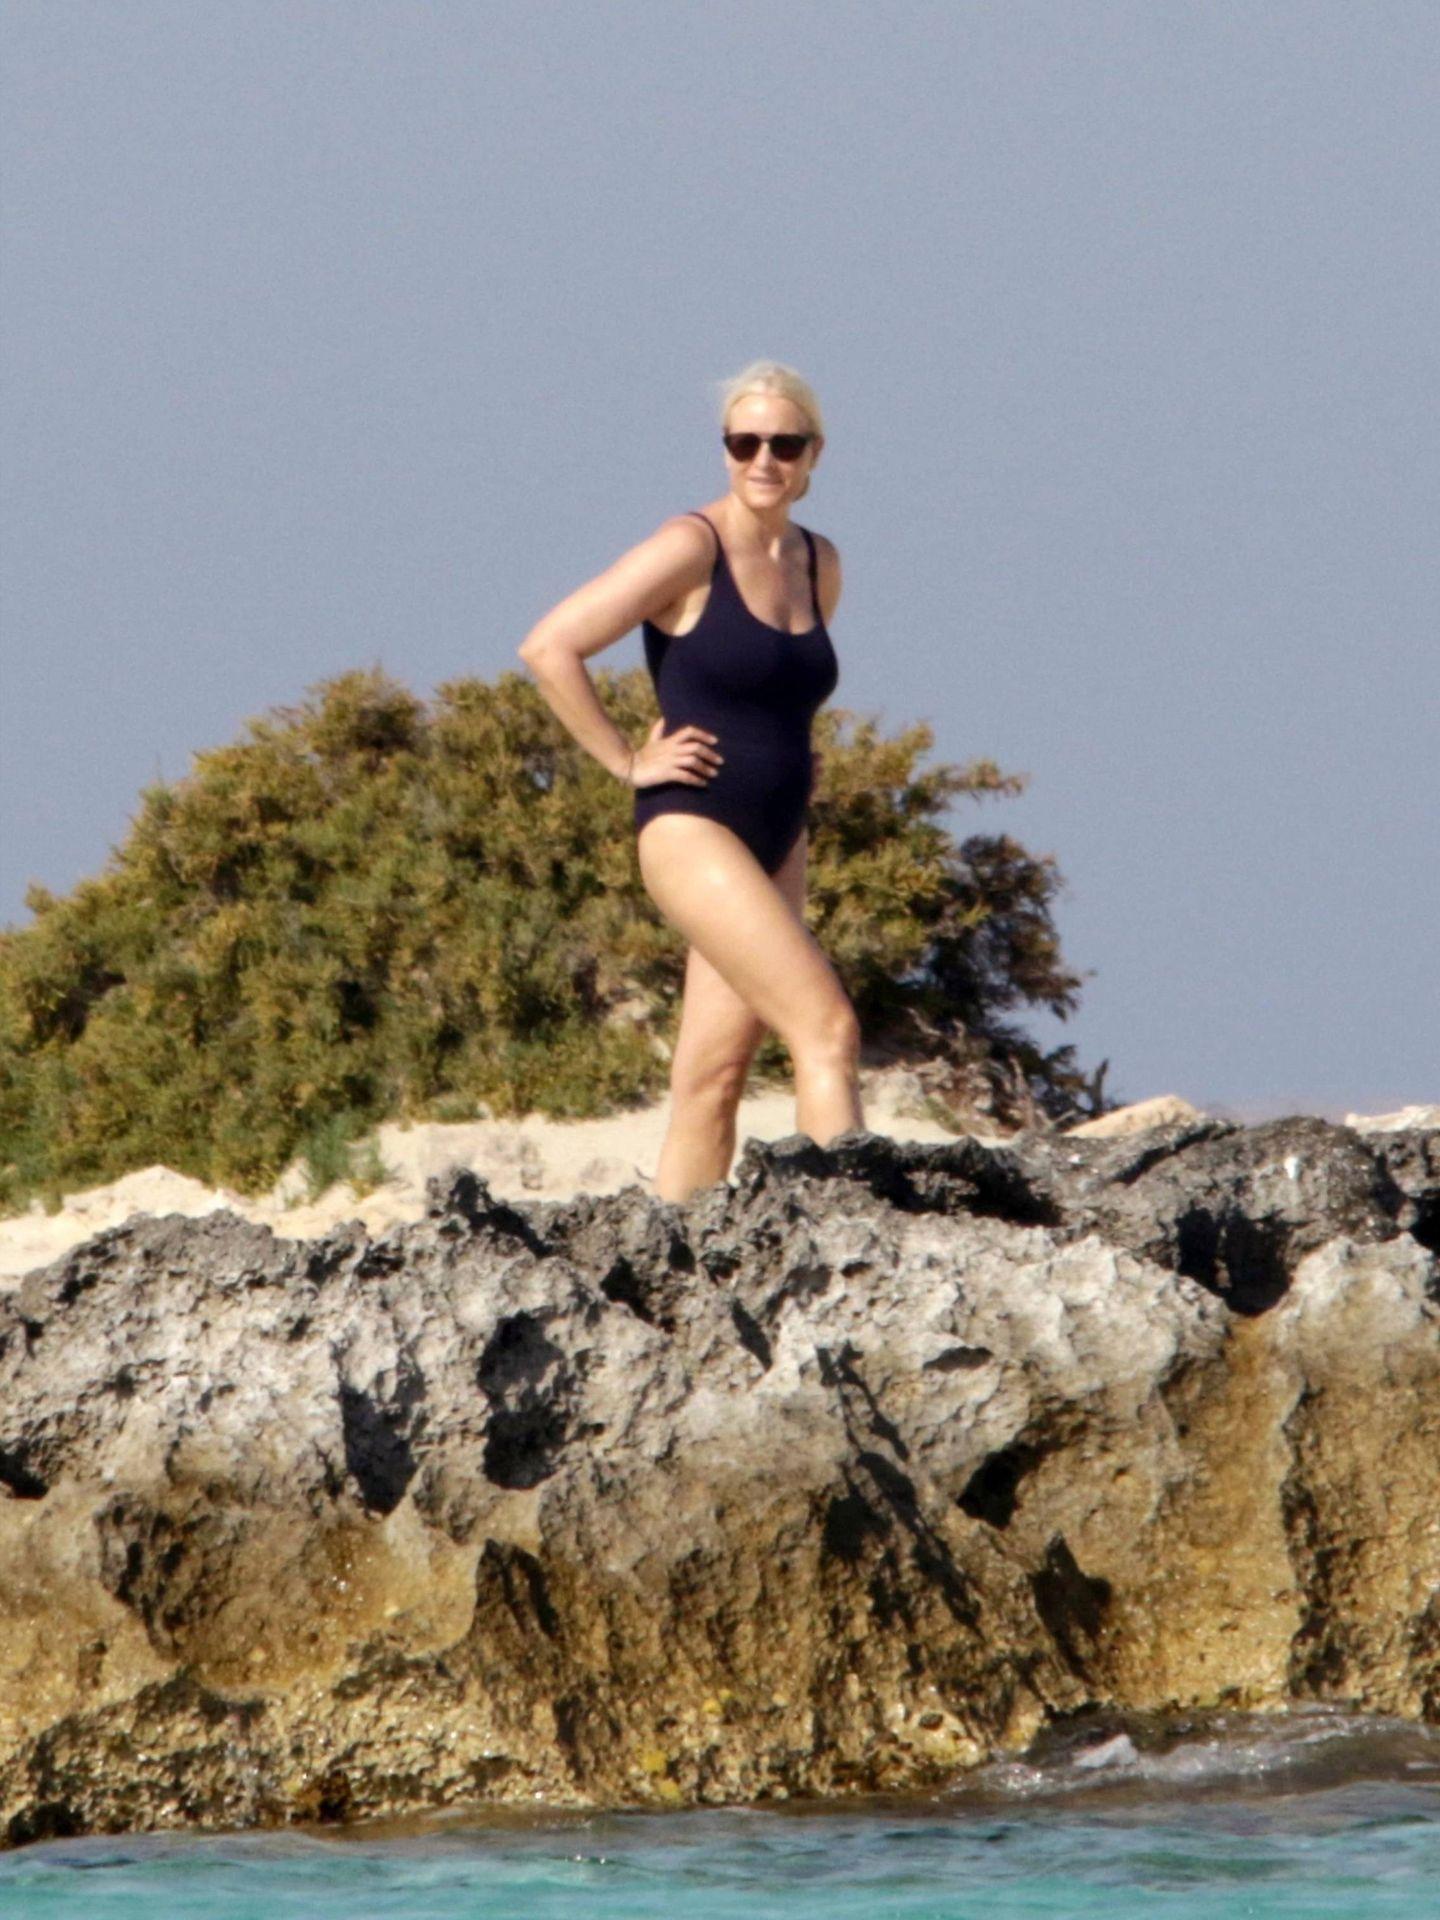 Mette-Marit en Formentera. (Vanitatis)